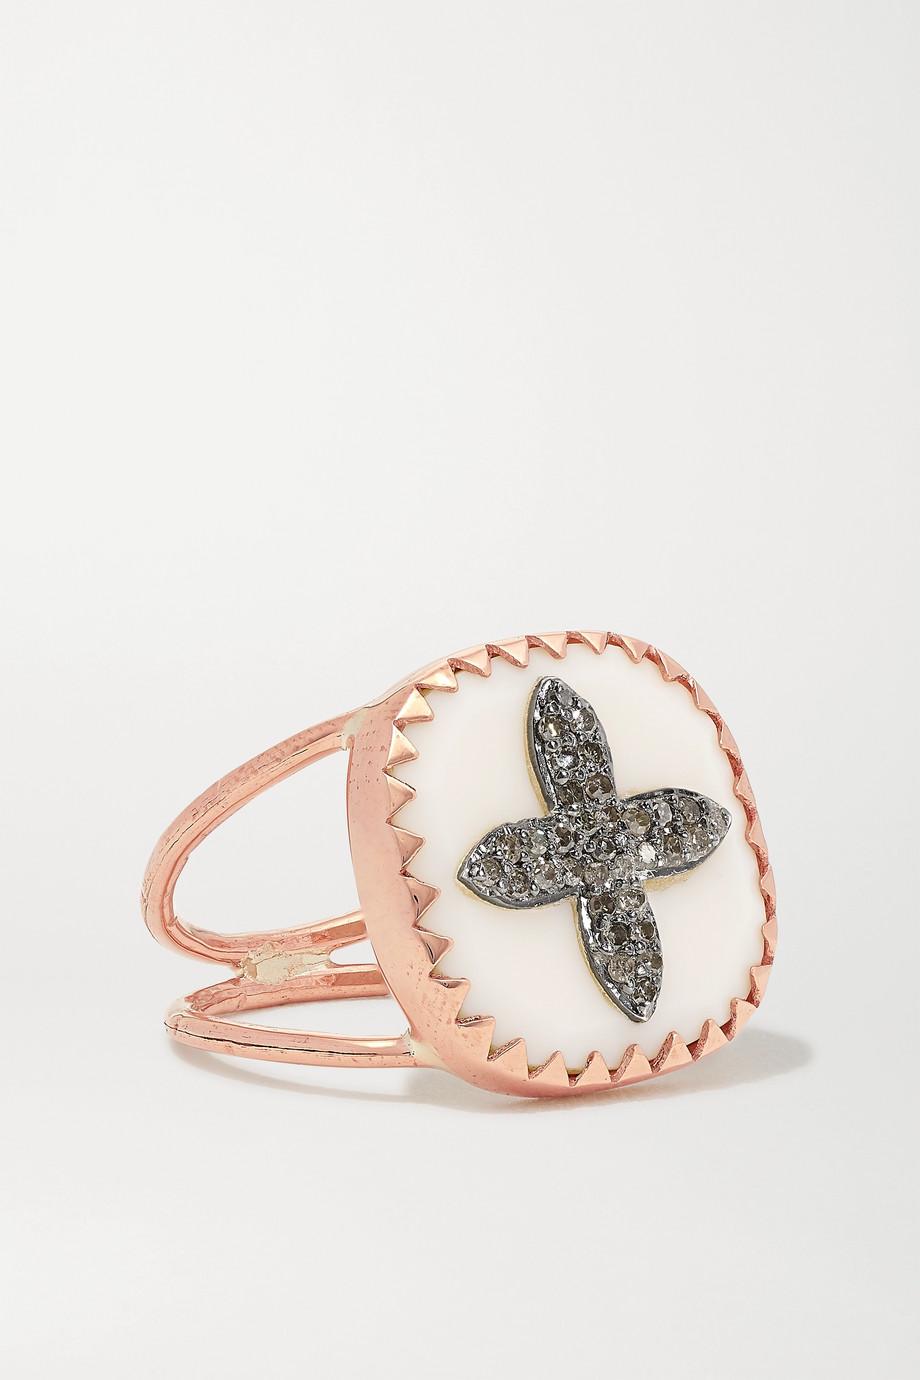 Pascale Monvoisin Bowie N°2 9K 玫瑰金、纯银、树脂、钻石戒指